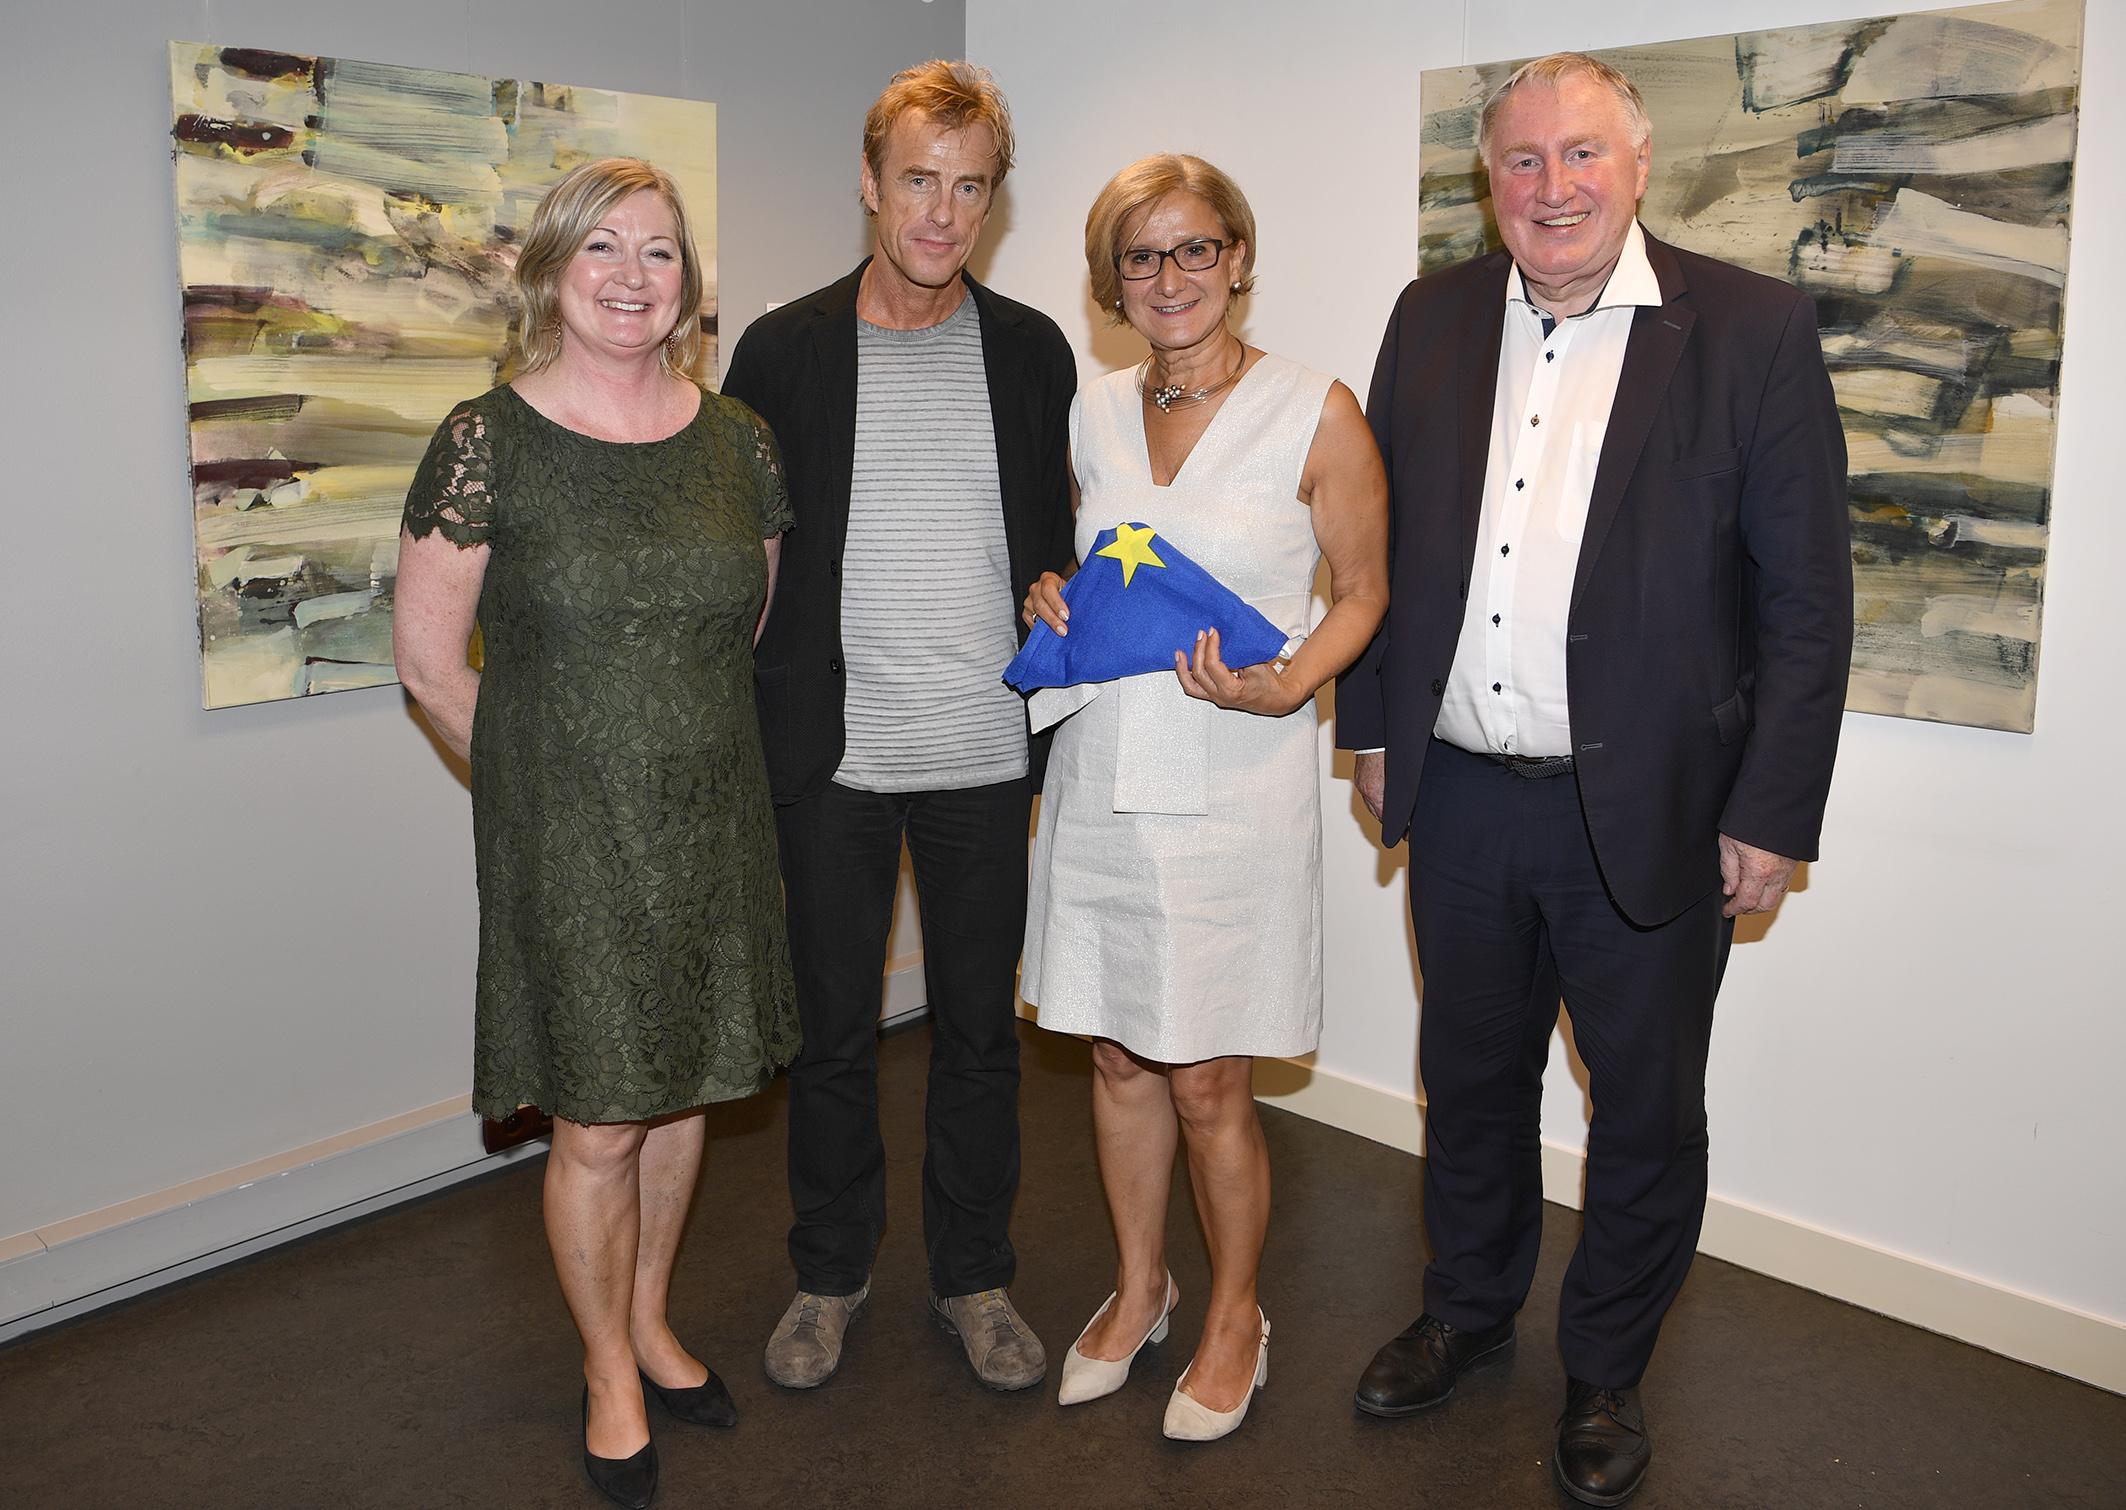 (von links nach rechts): Frau Ilse Penders-Stadlmann, Leiterin des NÖVBB, Kurt Schönthaler; Frau Johanna Mikl-Leitner, Landeshauptfrau NÖ, Herr Karl-Heinz Lambertz, Präsident des europäischen Ausschusses der Regionen (AdR); Foto: COPYRIGHT: NLK Reinberger